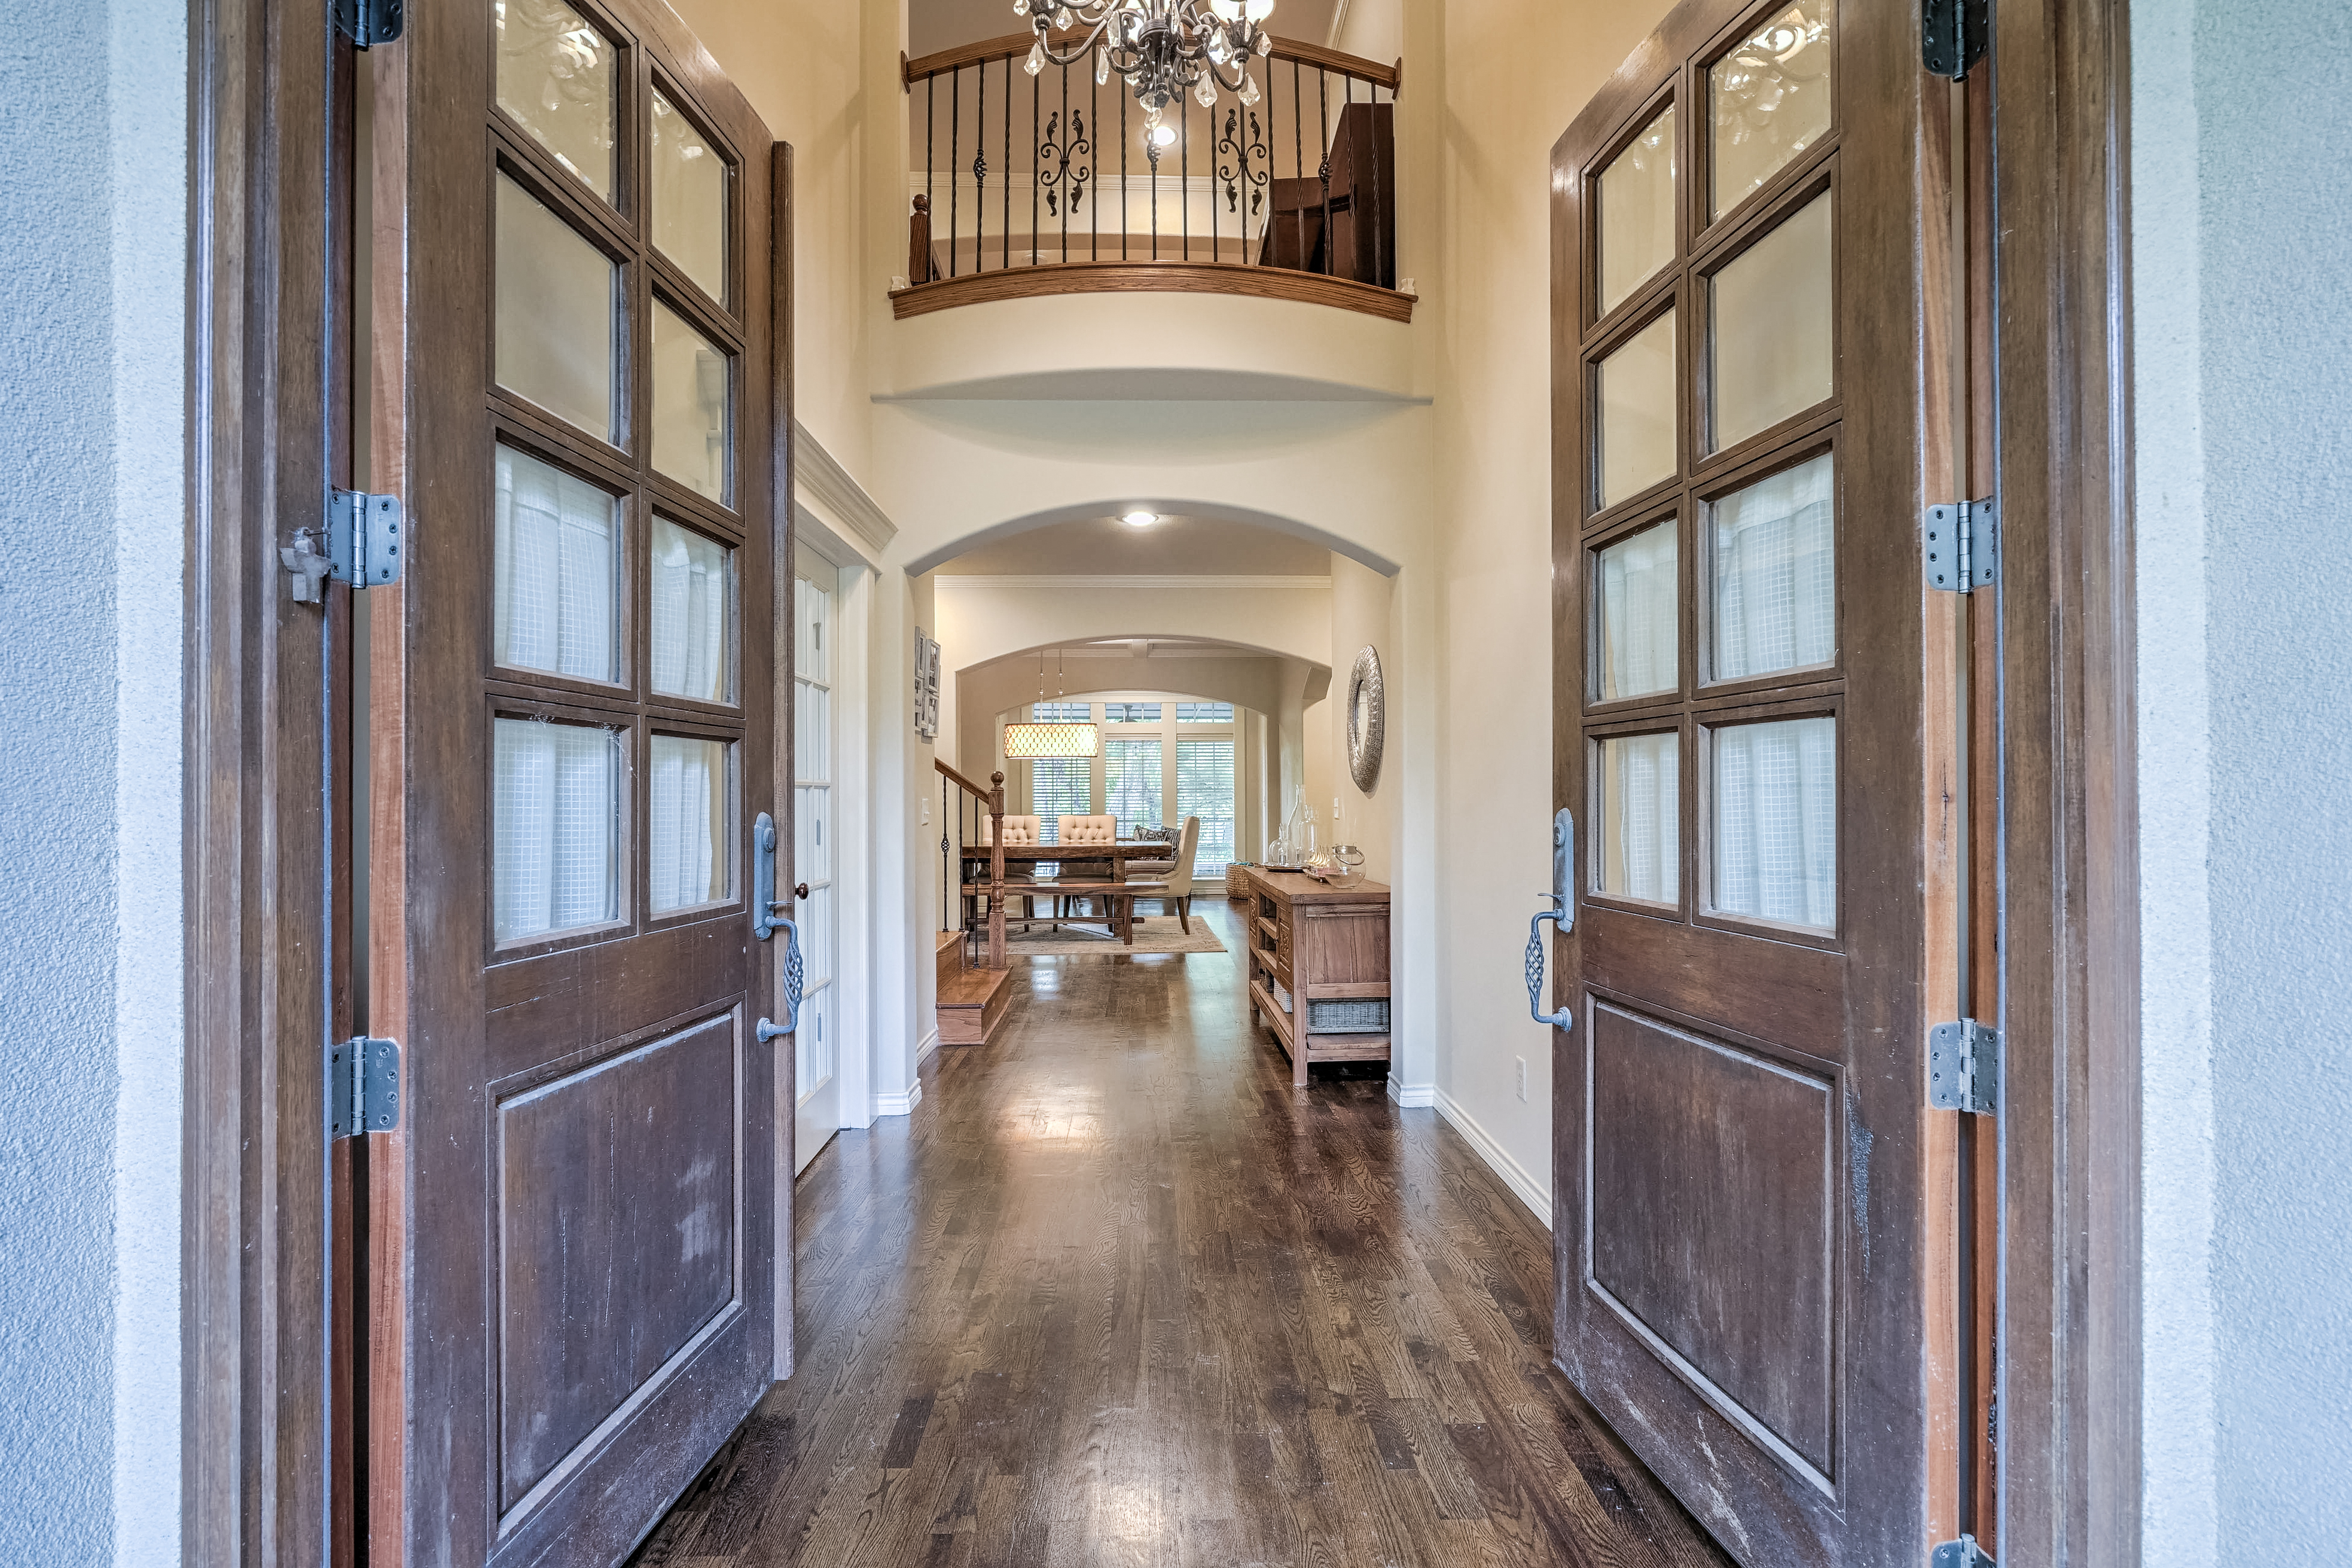 10320 S 92nd East Avenue Property Photo 6